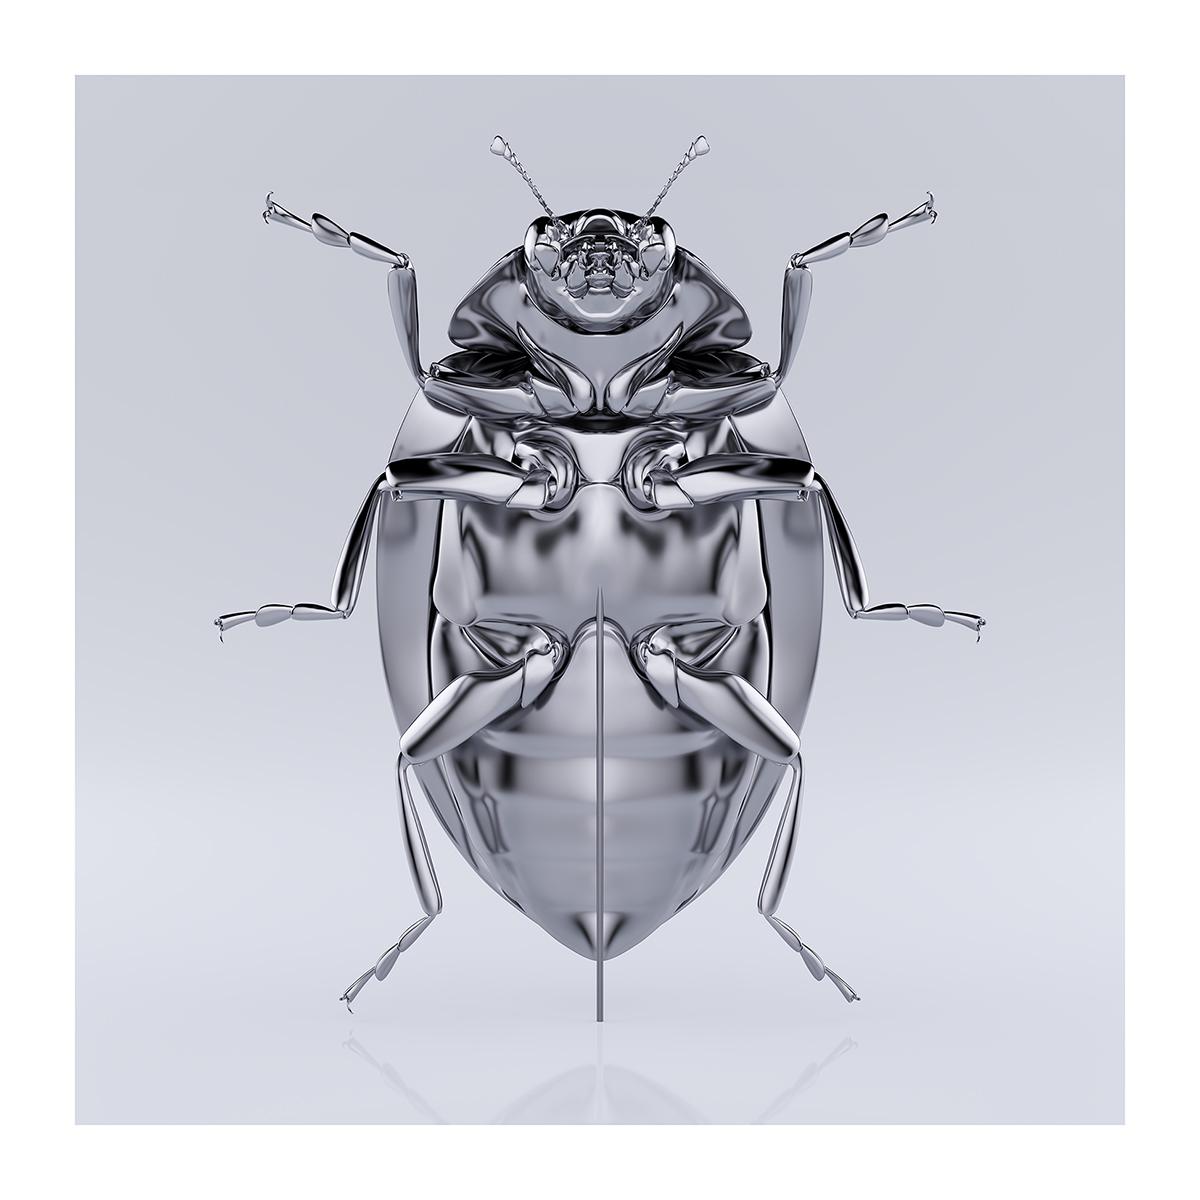 These were the Insects 005 1 - 2020 - These were the Insects